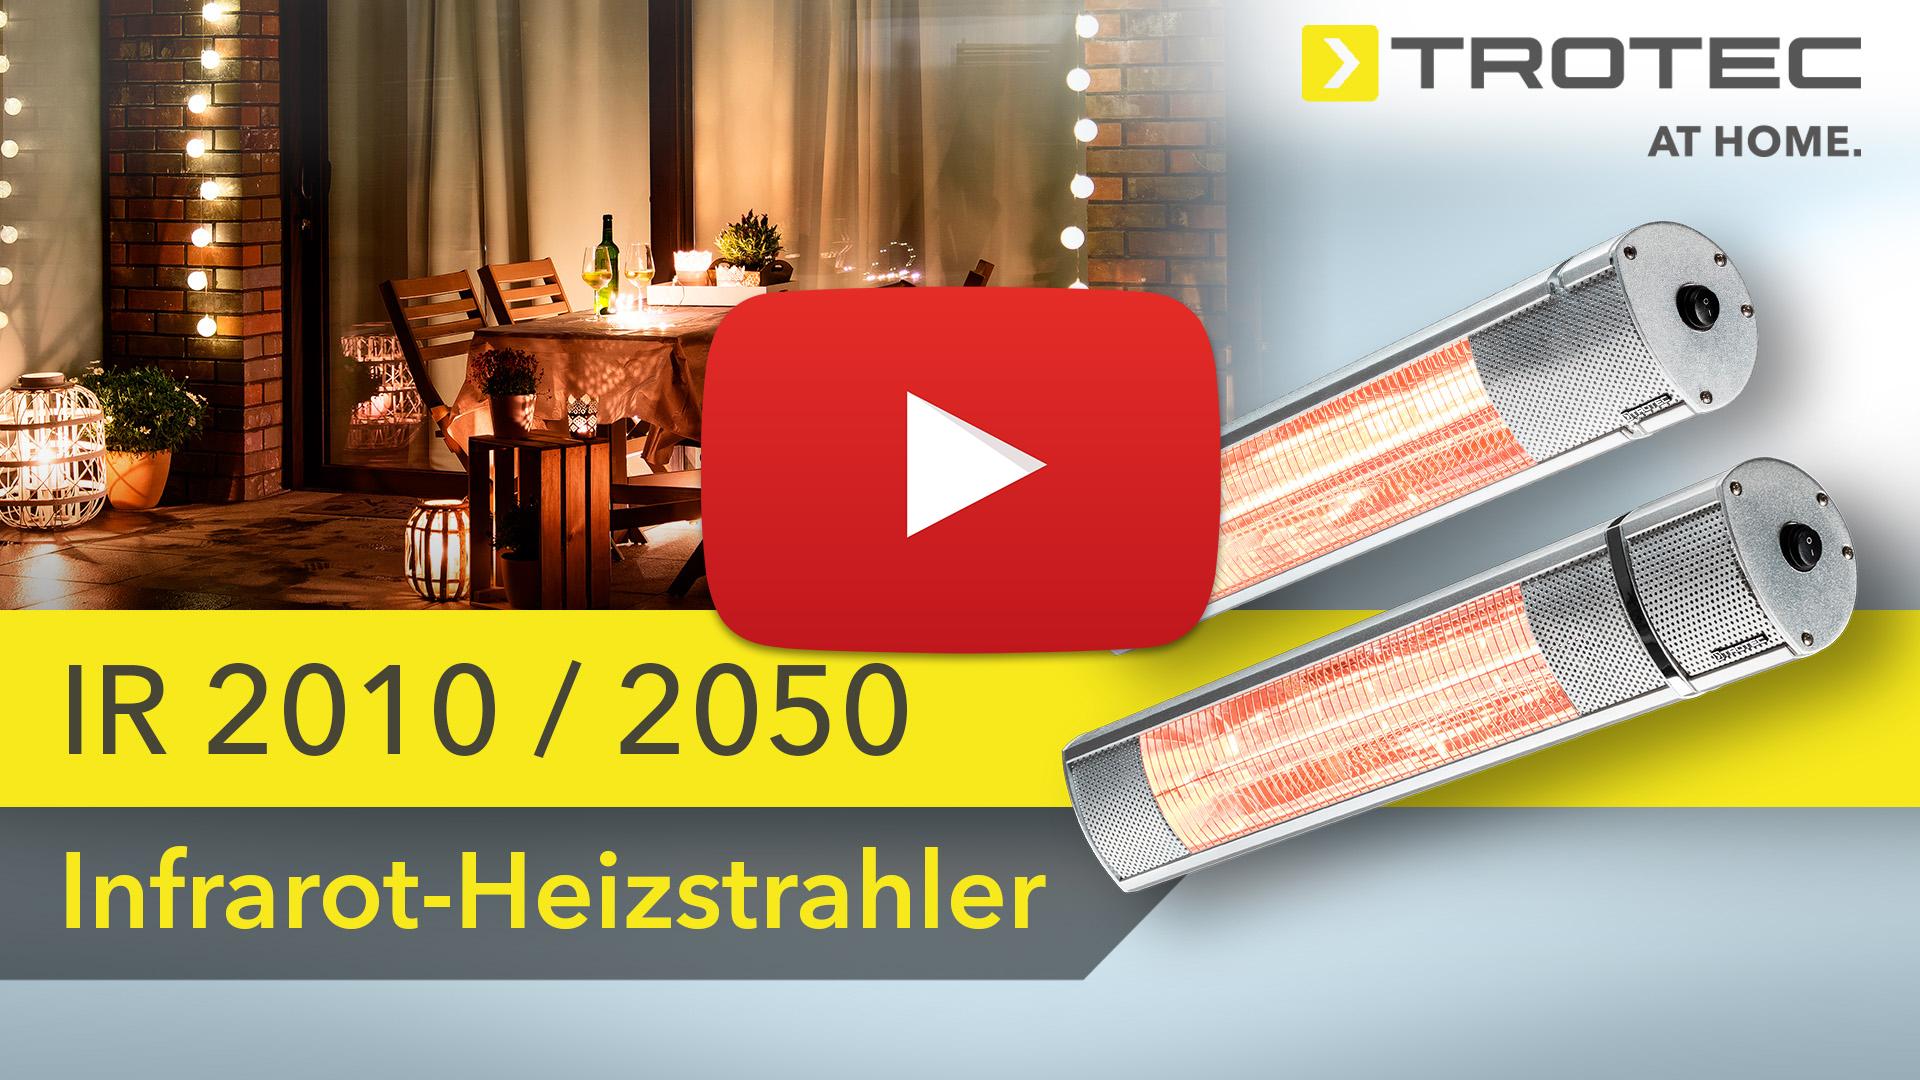 Infrarot Entfernungsmesser Funktionsweise : Heizstrahler ir 2050 trotec